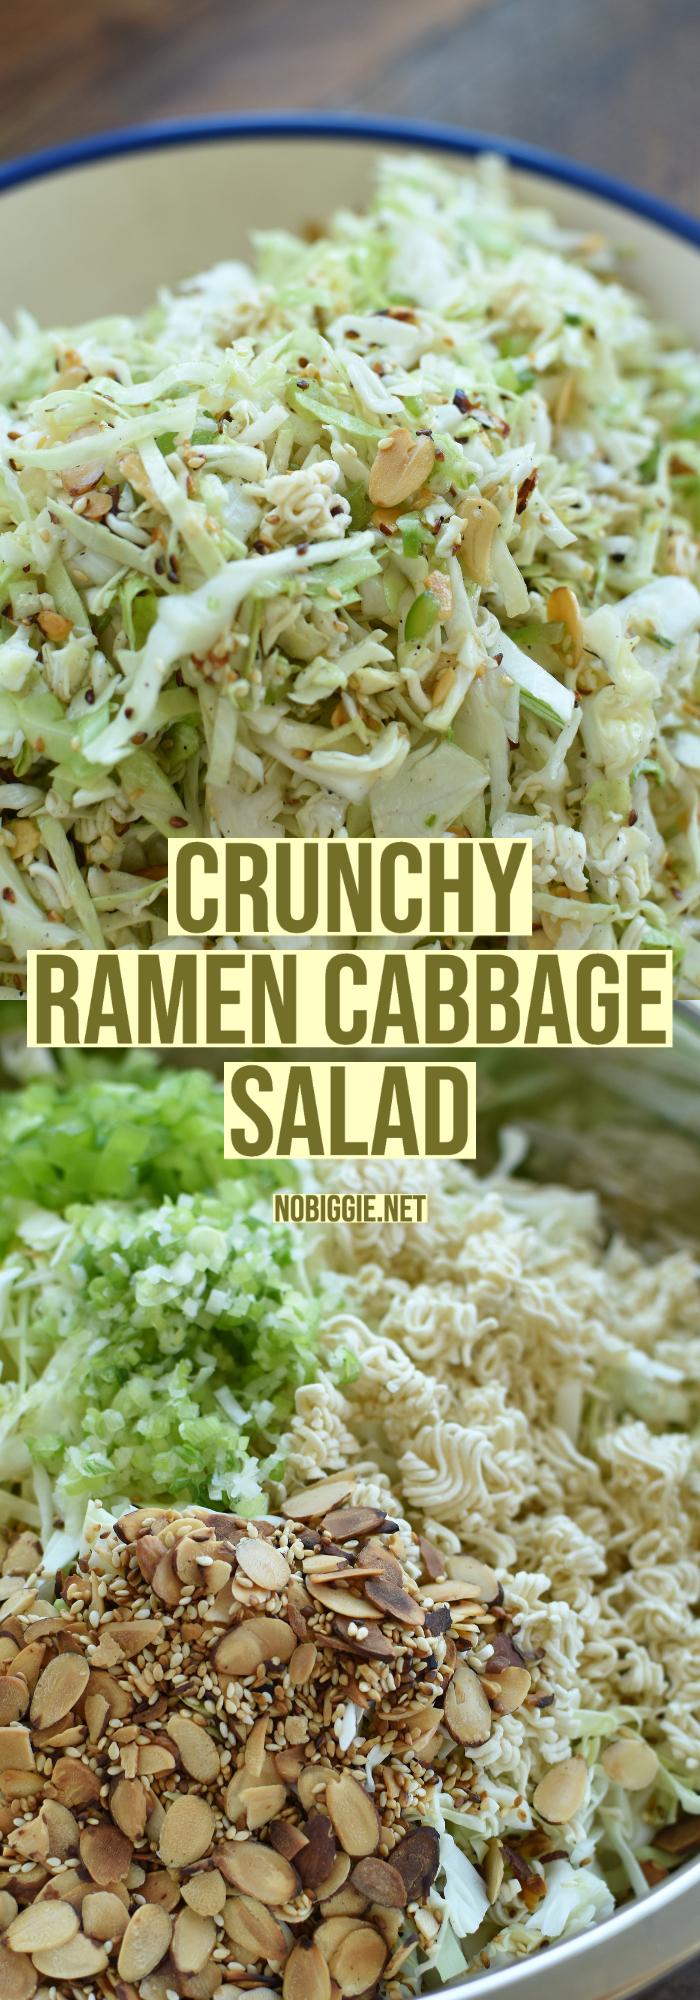 crunchy ramen cabbage salad | NoBiggie.net